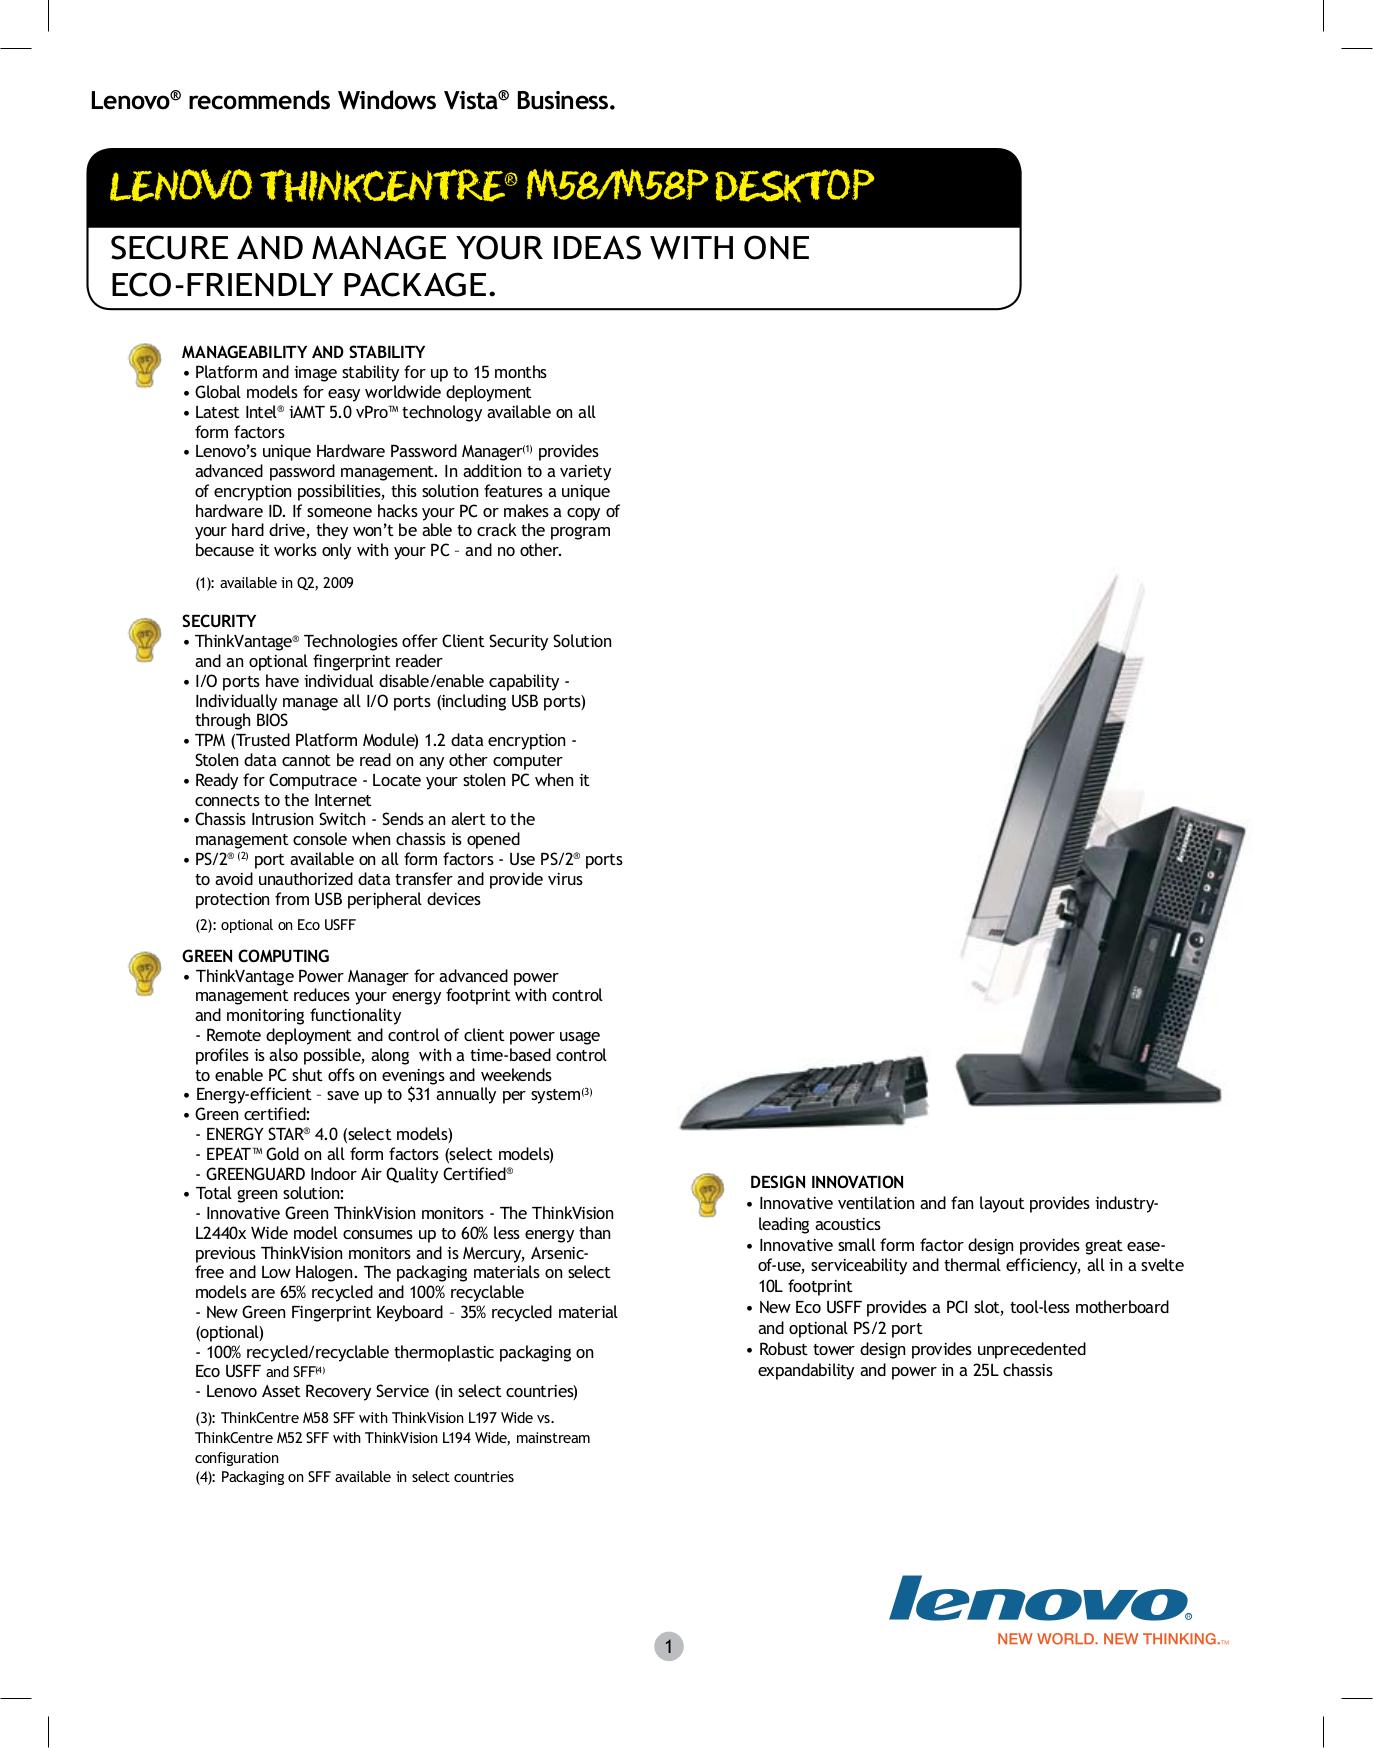 pdf for Lenovo Desktop ThinkCentre M58p 7630 manual